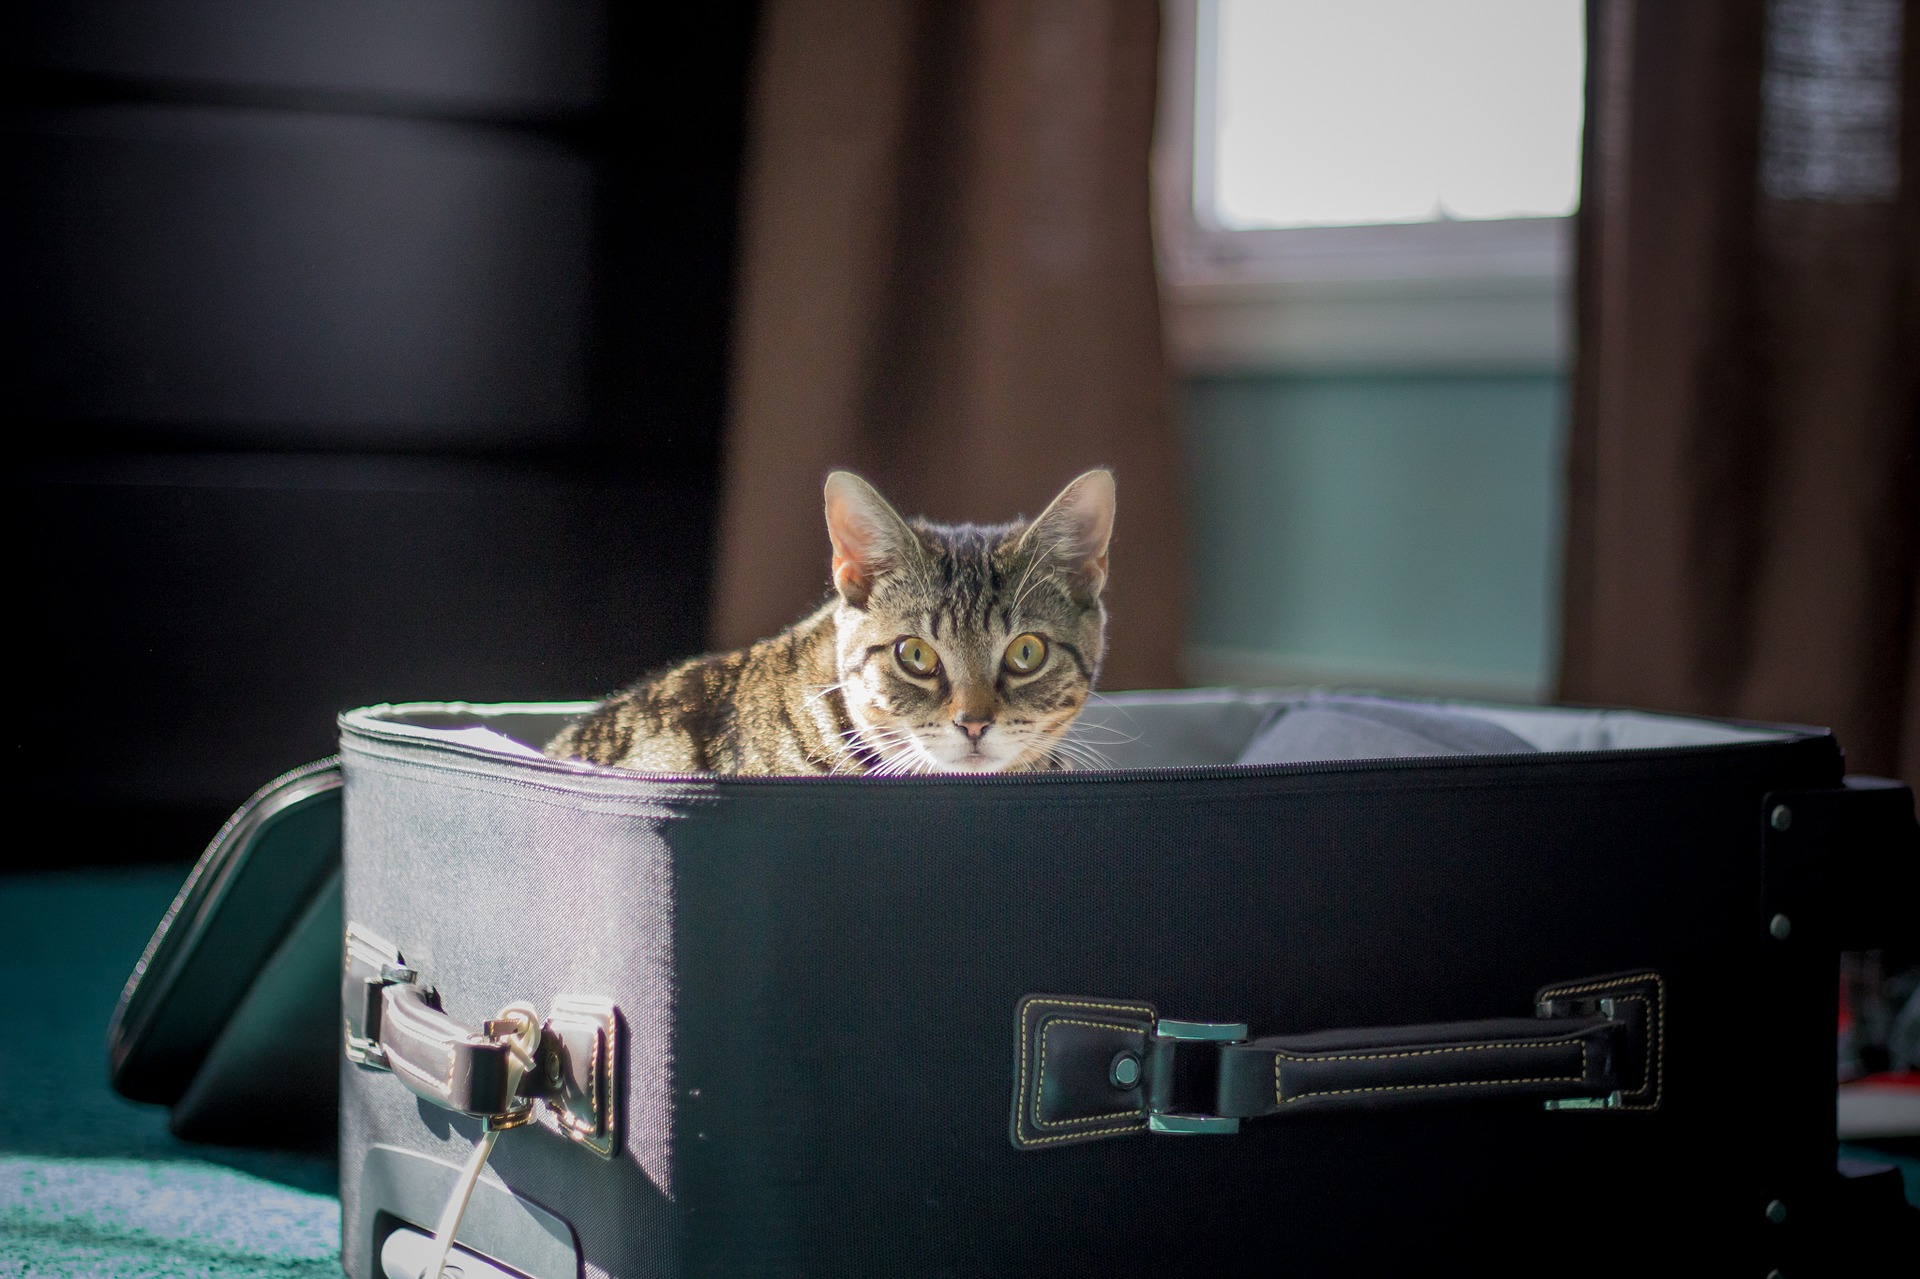 Usda Information For Cat International Travel